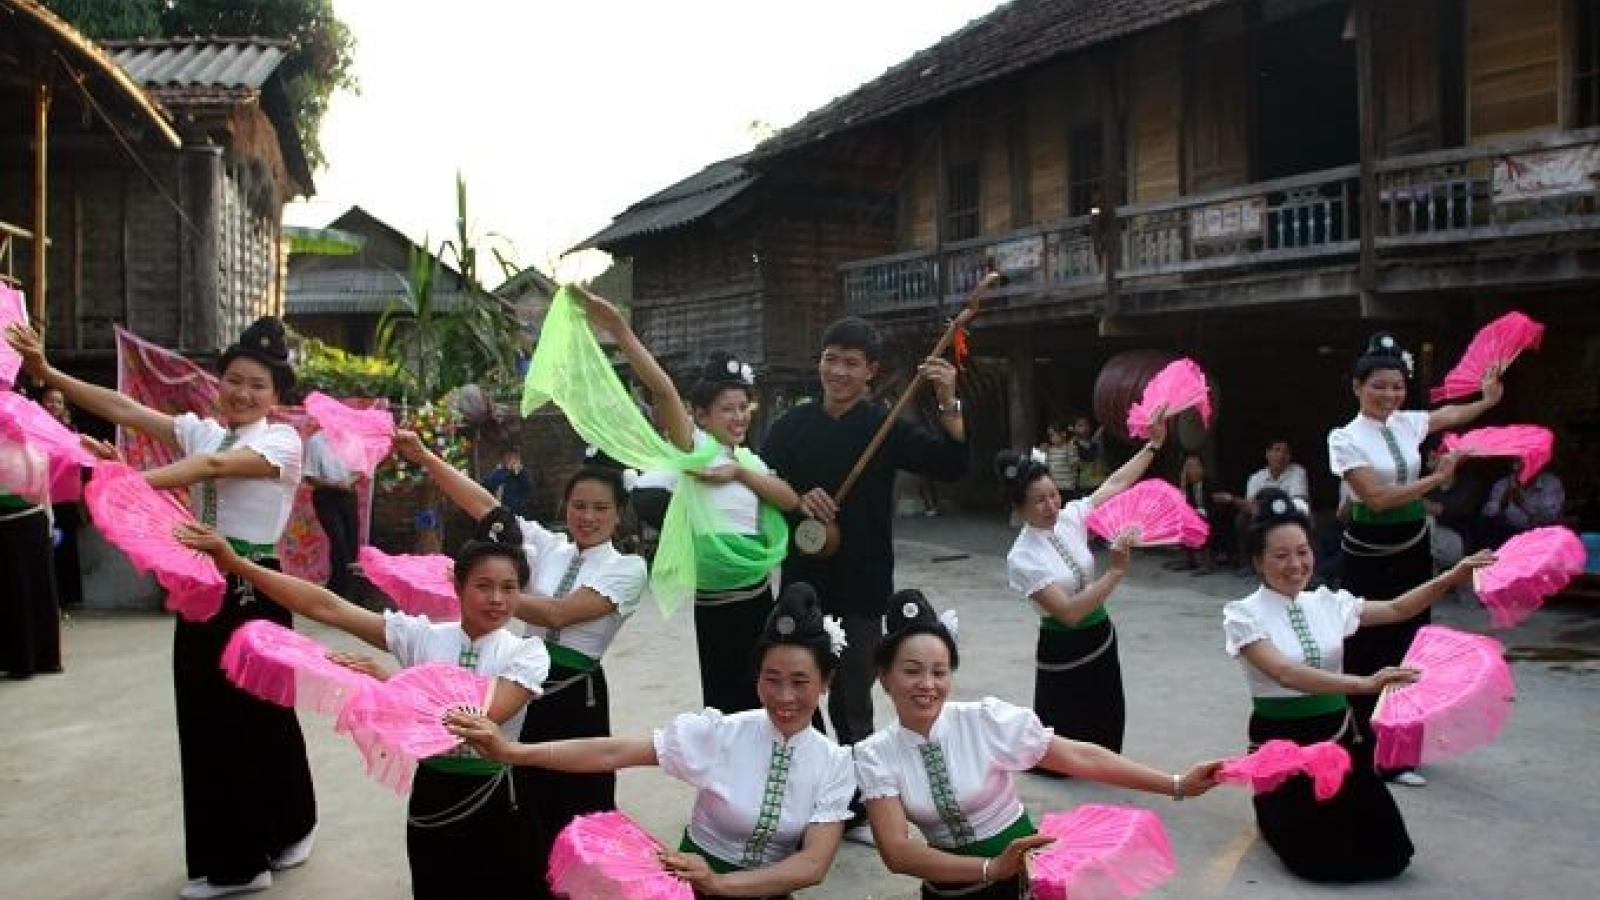 Buoc hamlet preserves Thai ethnic minority culture